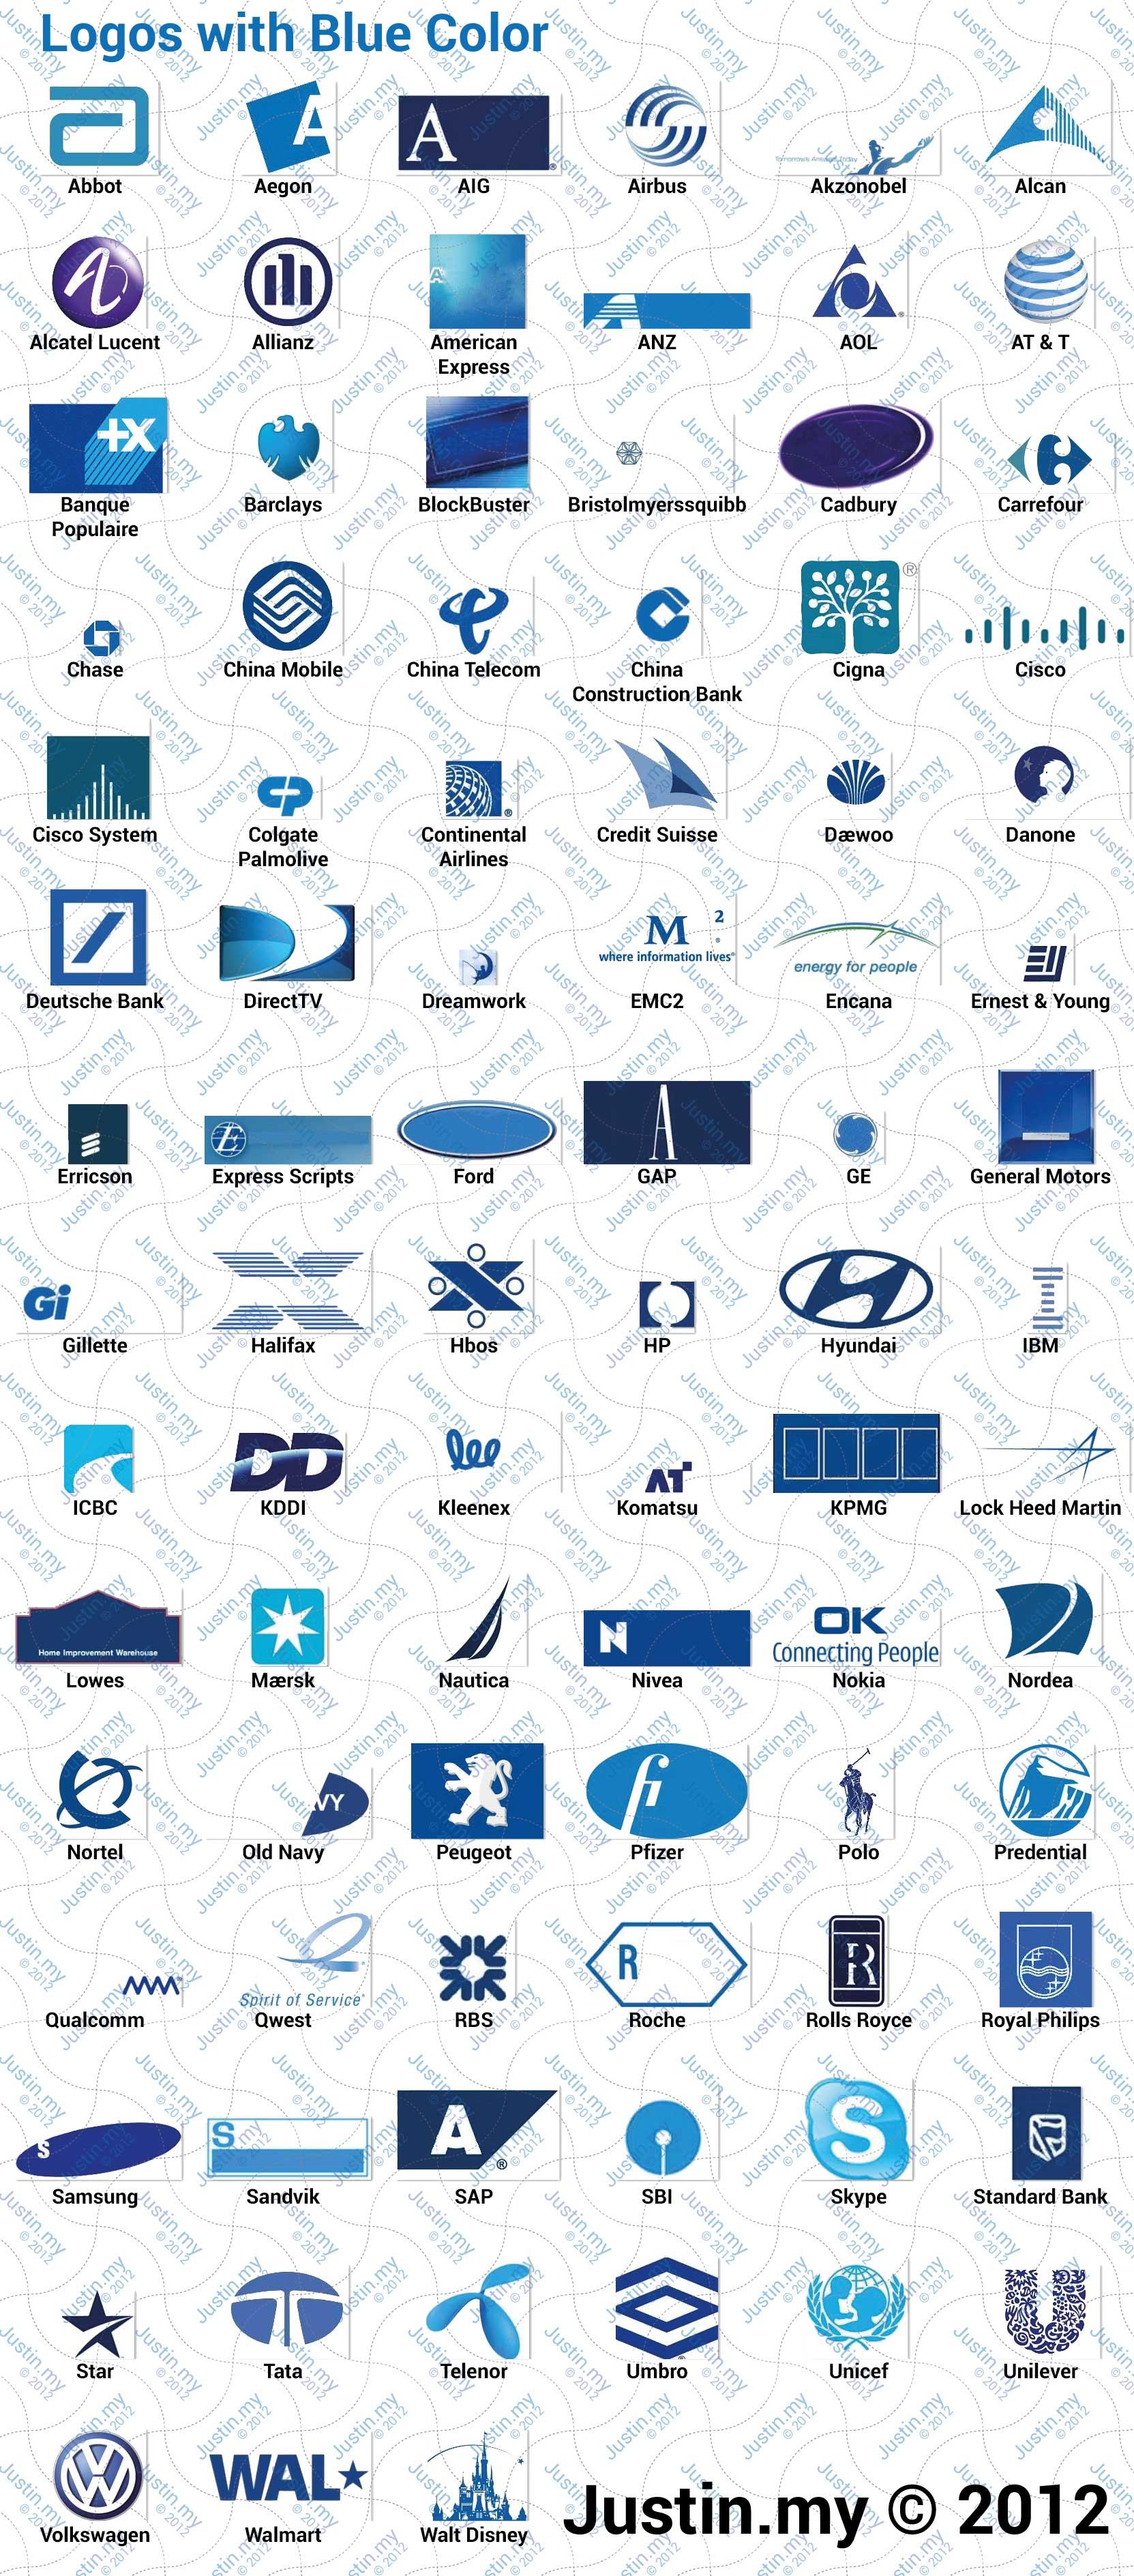 logos quiz answers justin my logo quiz emerging answers